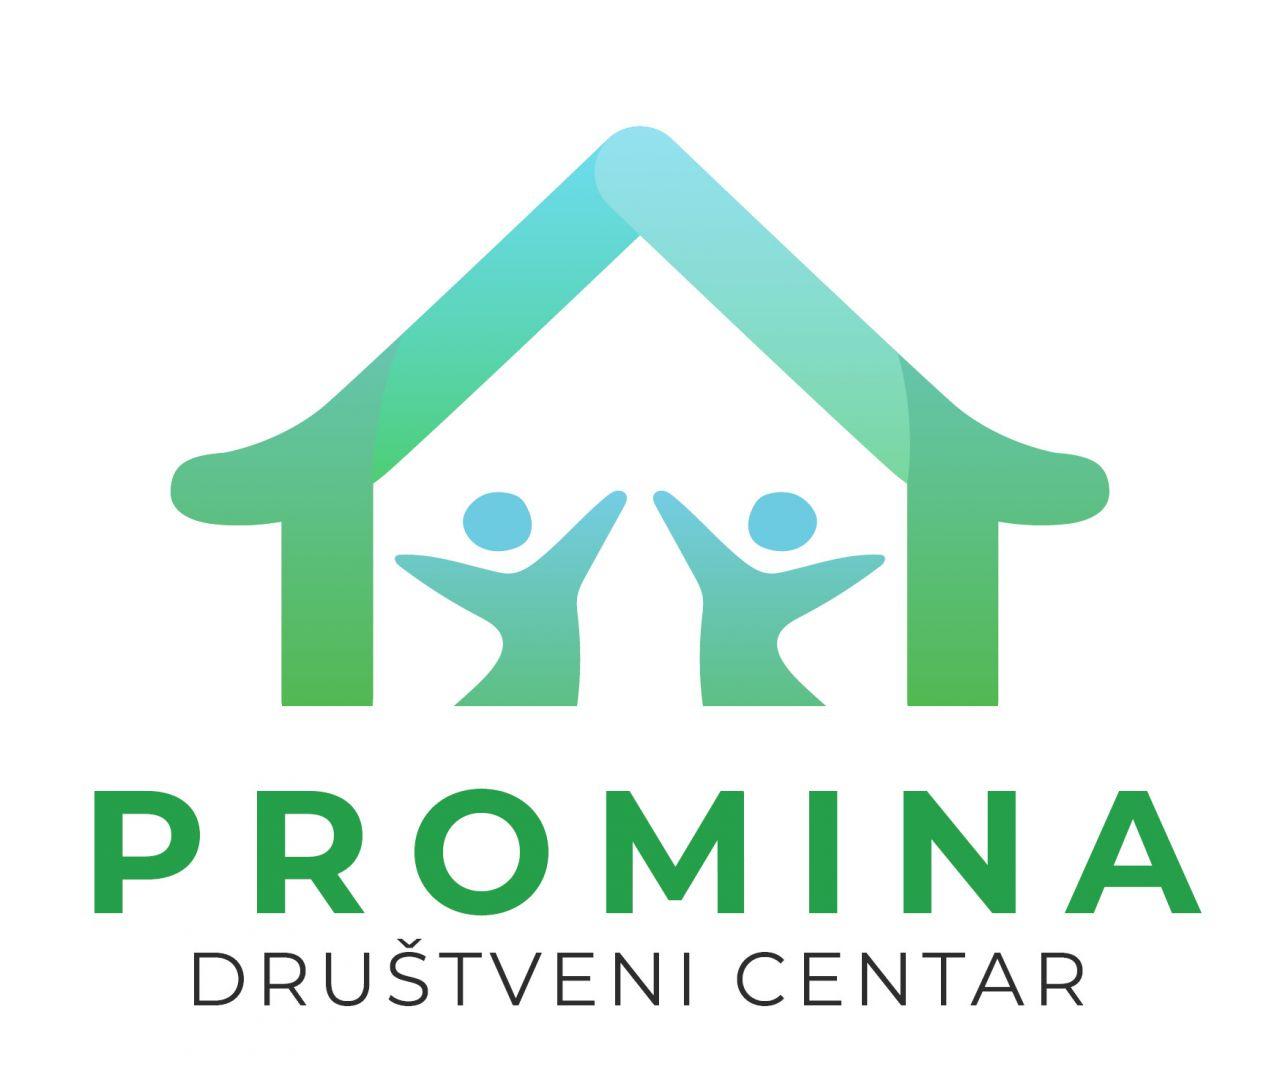 Društveni centar Promina - Kalendar događanja za 01/2021.